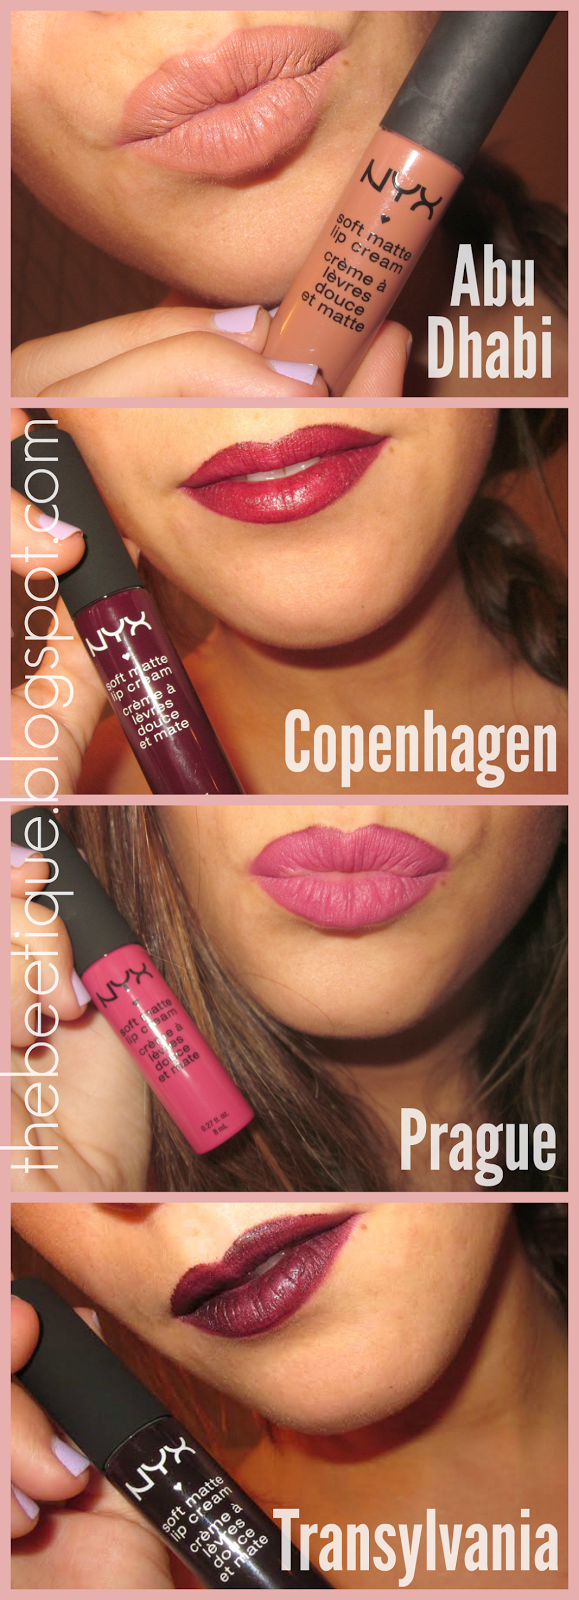 Nyx Soft Matte Lip Cream Transylvania Copenhagen Prague Abu Inez Contour Plus Lipstick Riviera Blush Dhabi Review Swatches Via Thebeetiqueblogspotcom